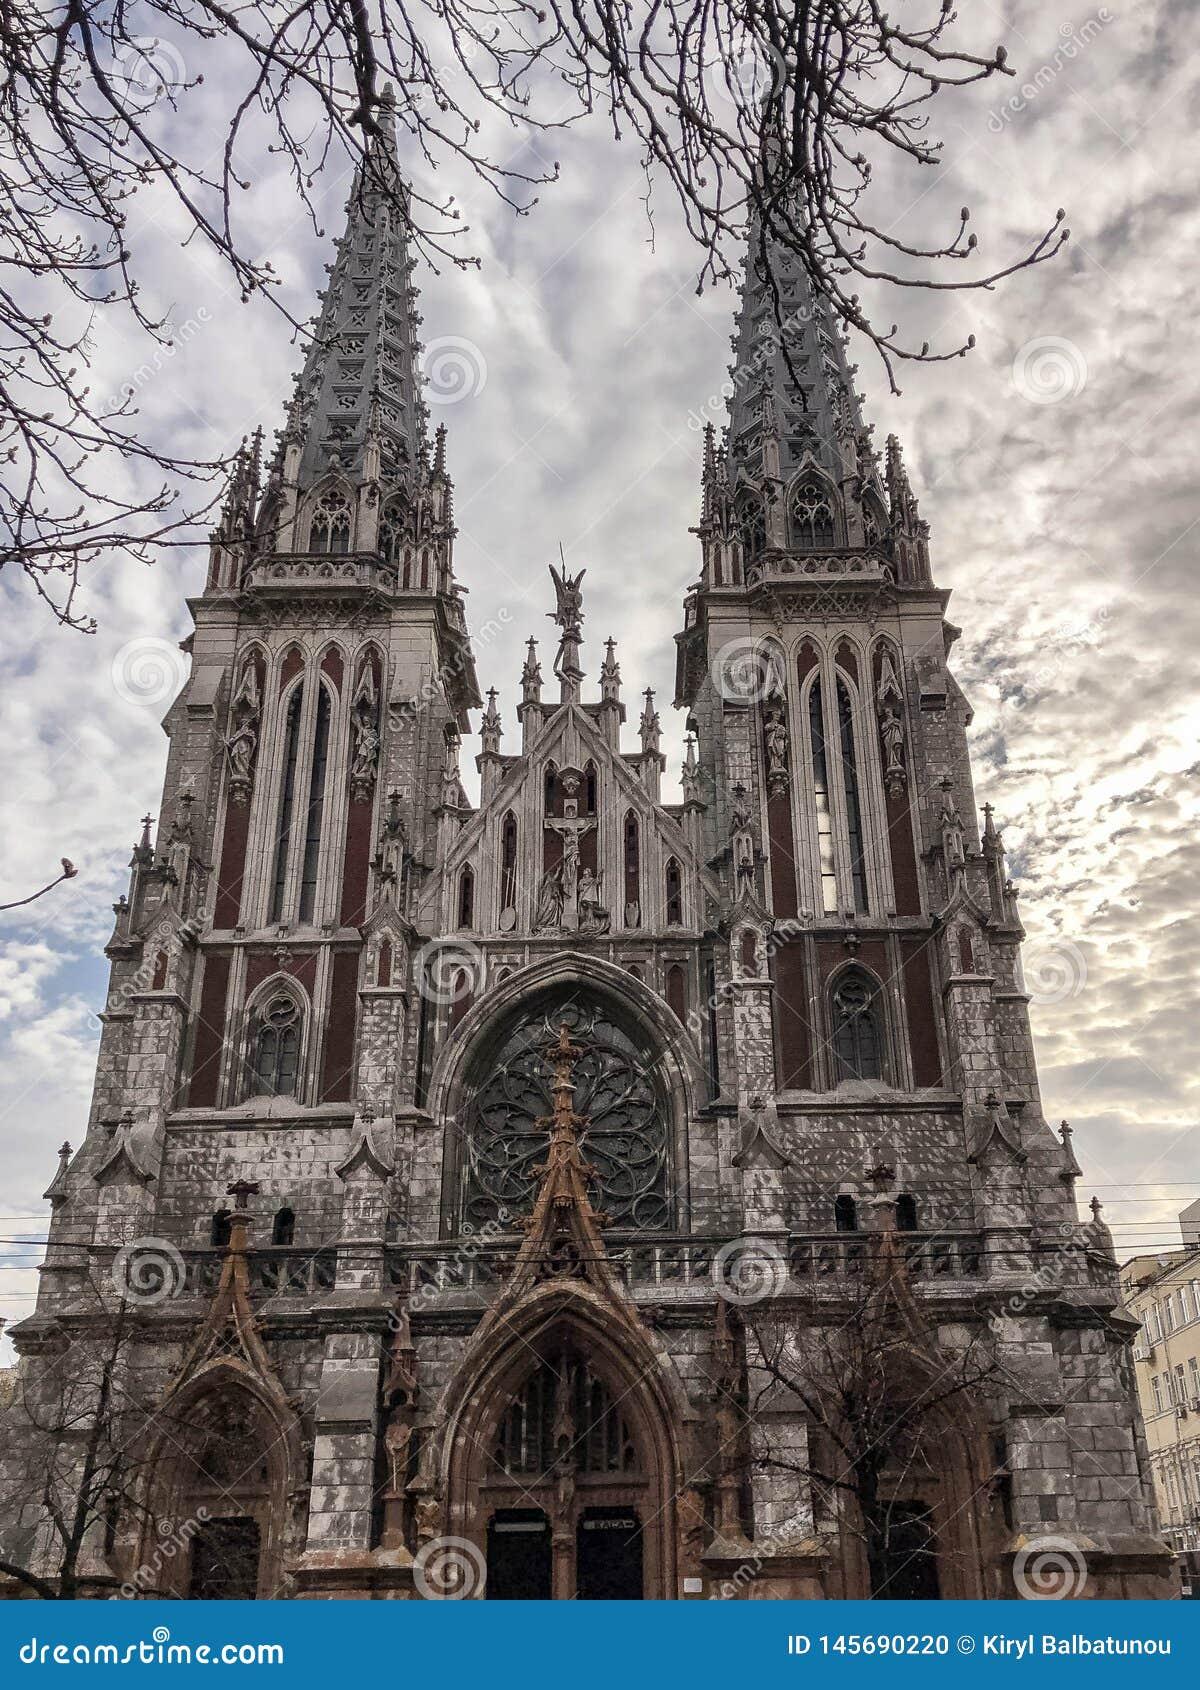 Gammal forntida medeltida grå kuslig läskig katolik, ortodox gotisk kyrka med spiers Europeisk arkitektur